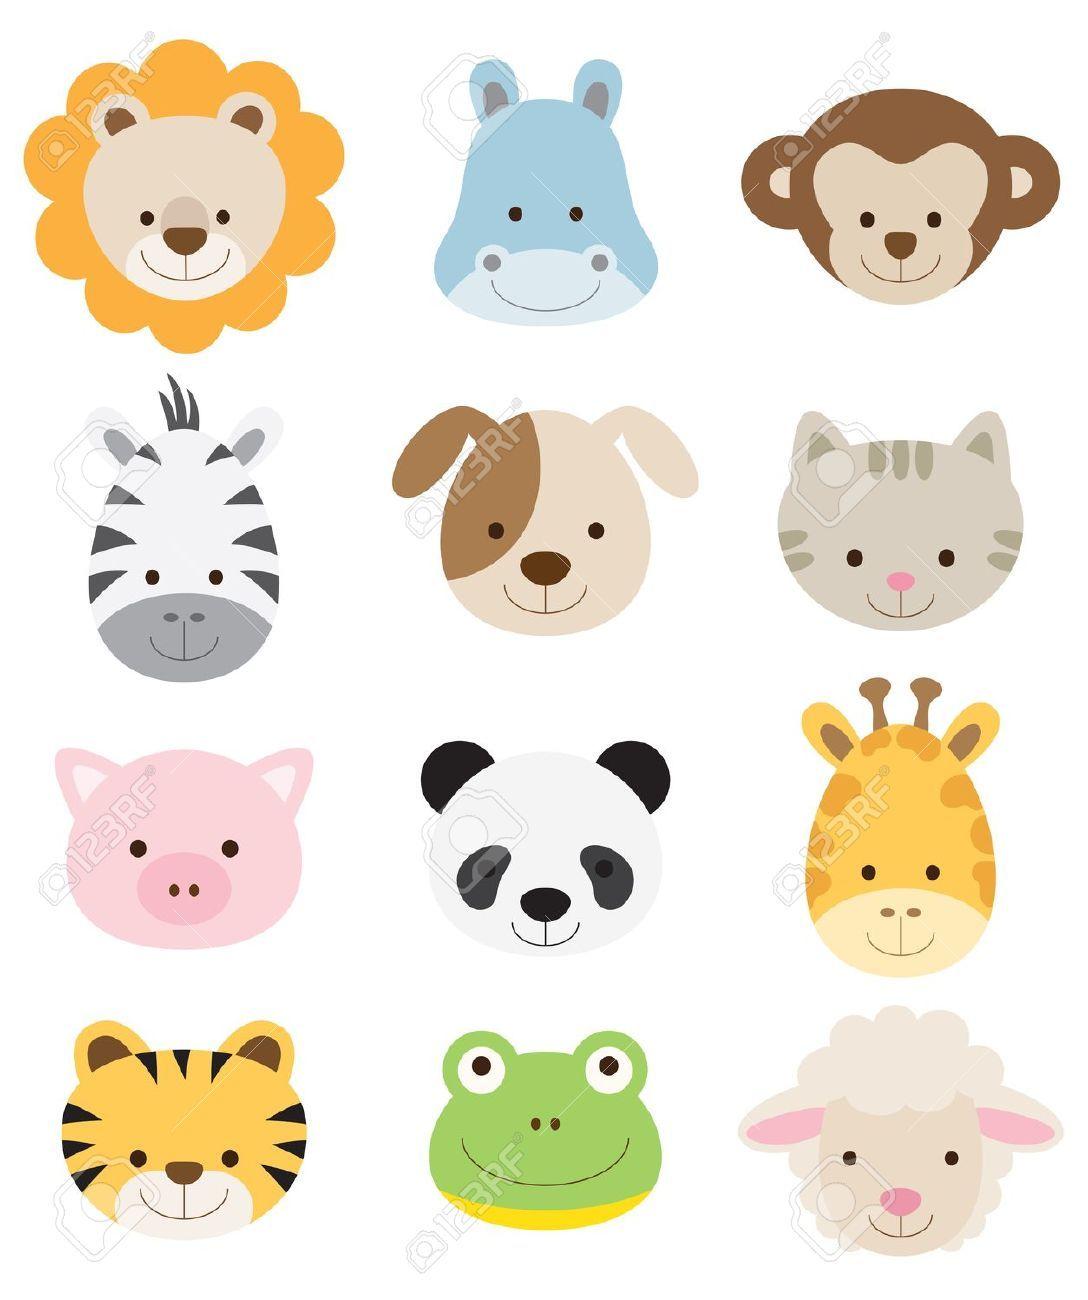 animales bebes para baby shower en porcelana buscar con google